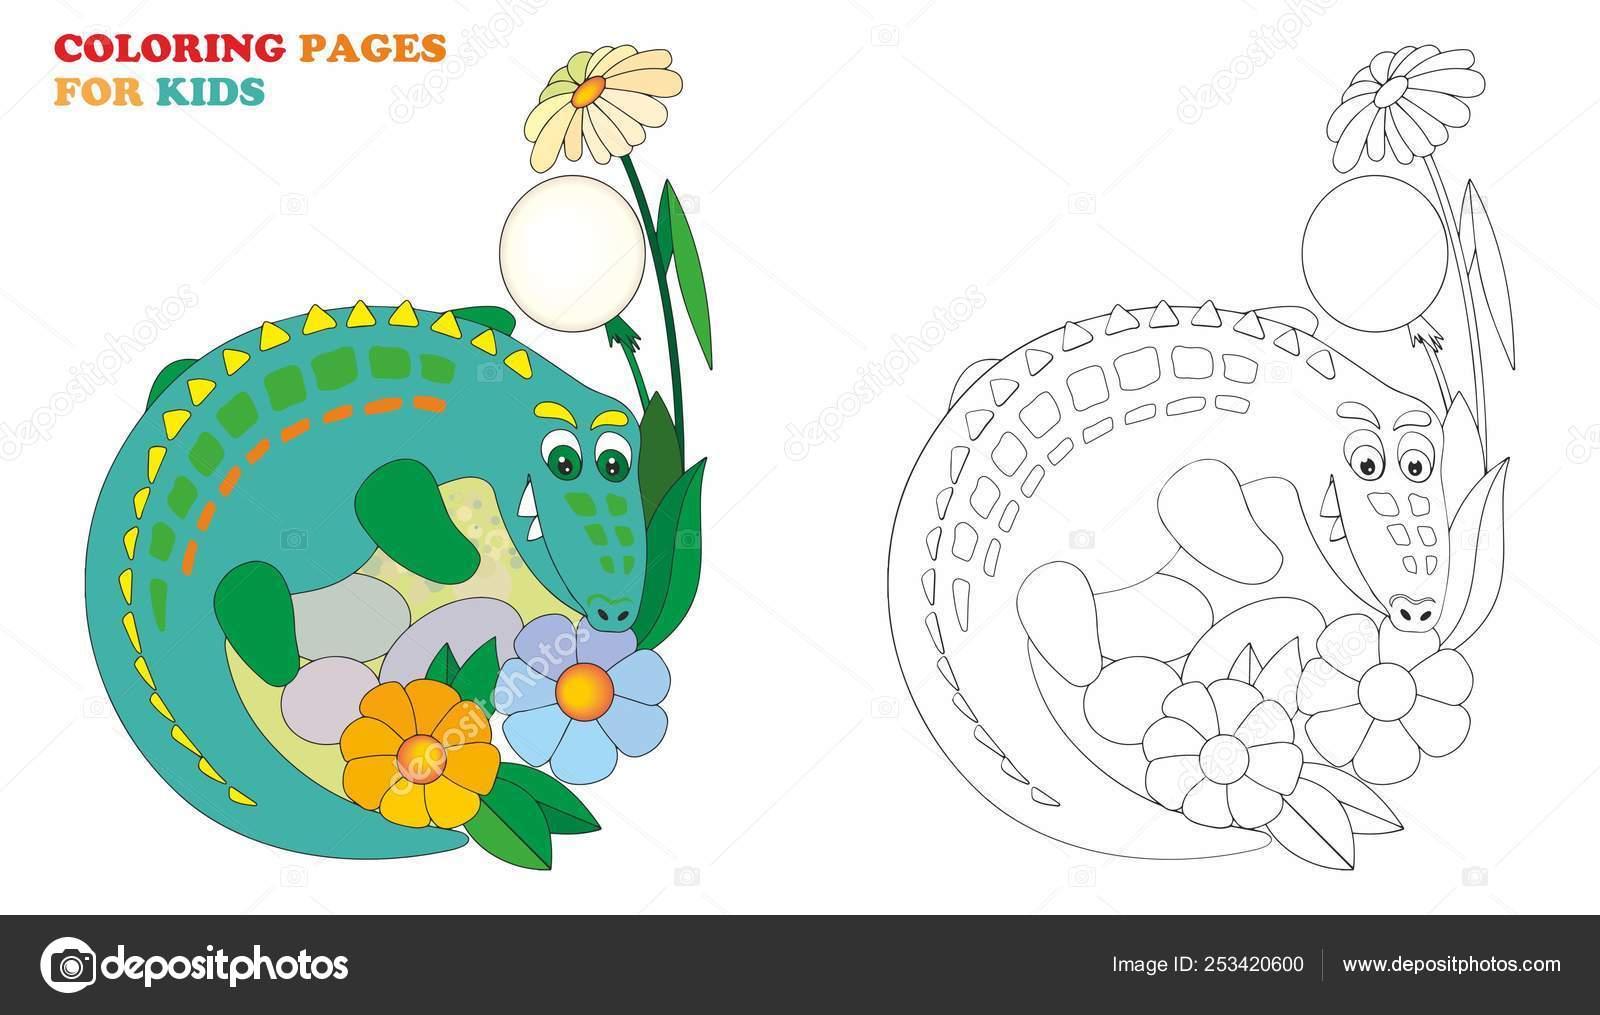 Orinoco Crocodile Coloring Page - Free Crocodile Coloring Pages ...   1015x1600